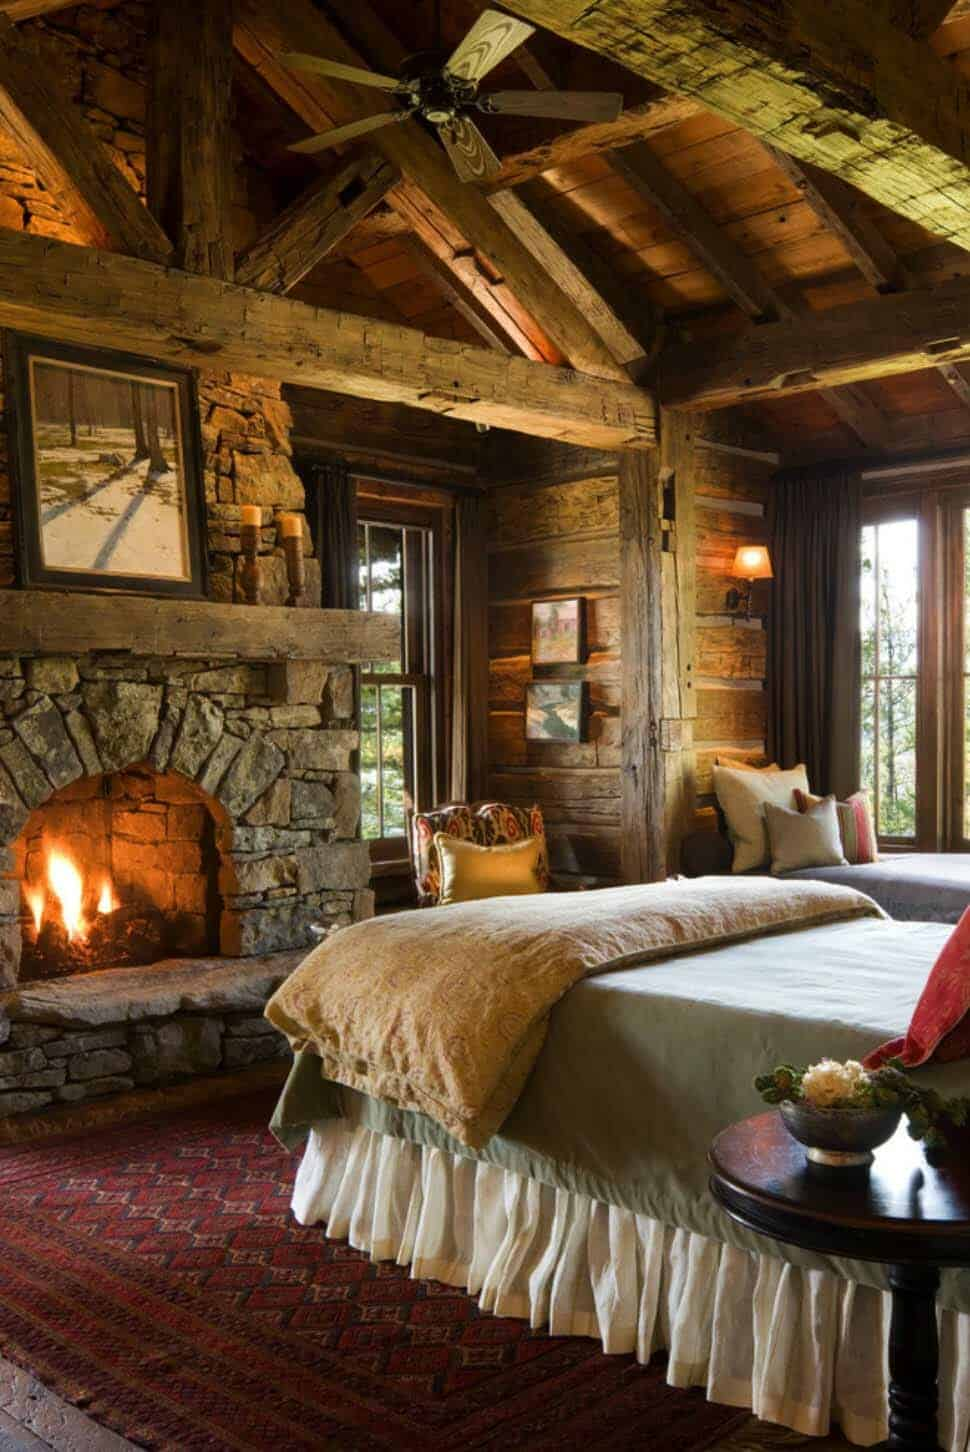 Rustic mountain home showcases inspiring views of Big Sky Country